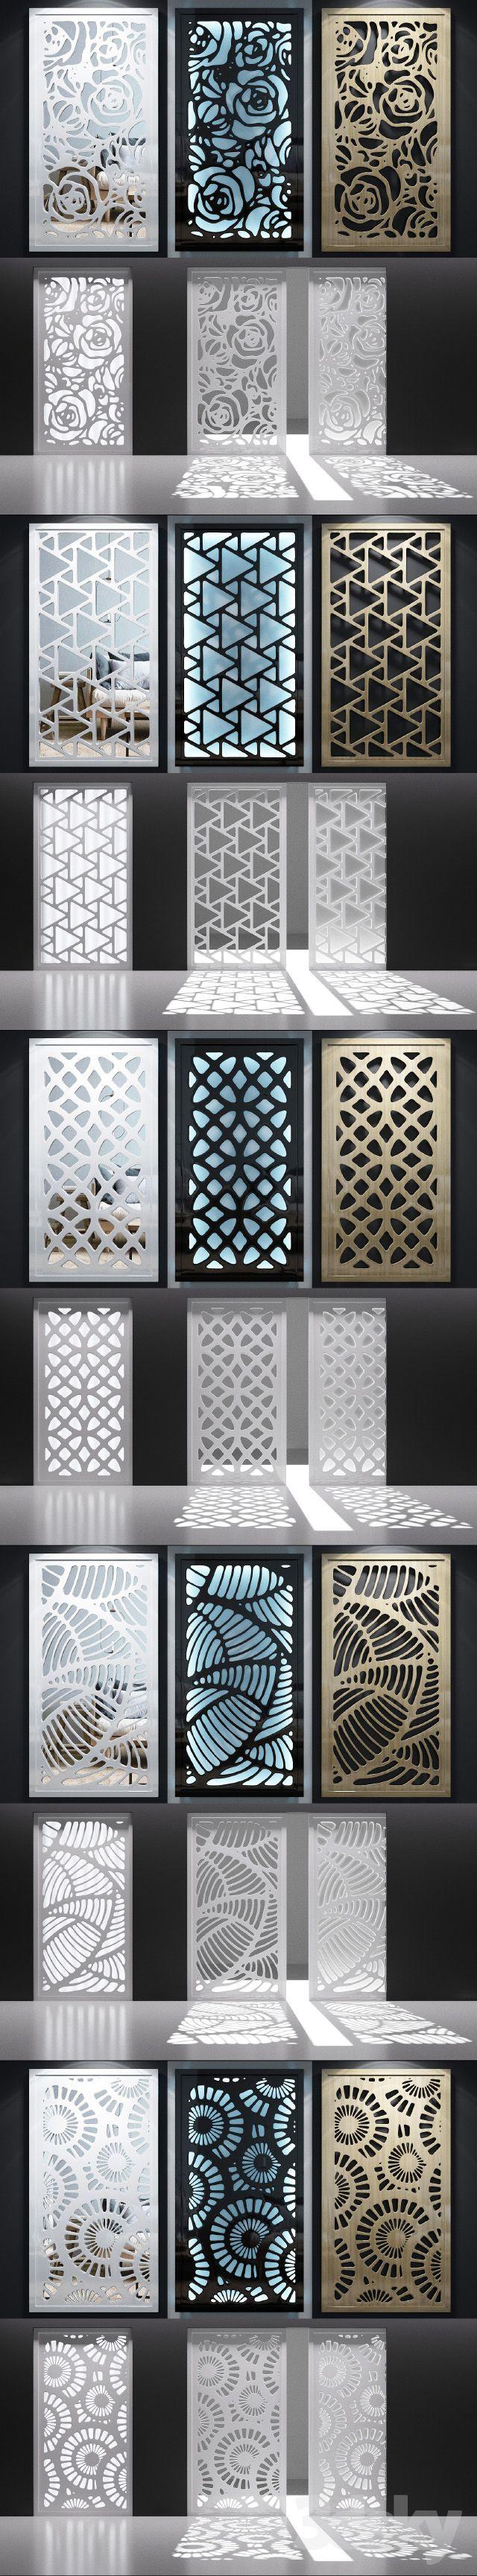 3d models: Other decorative objects - Set of decorative panels_06